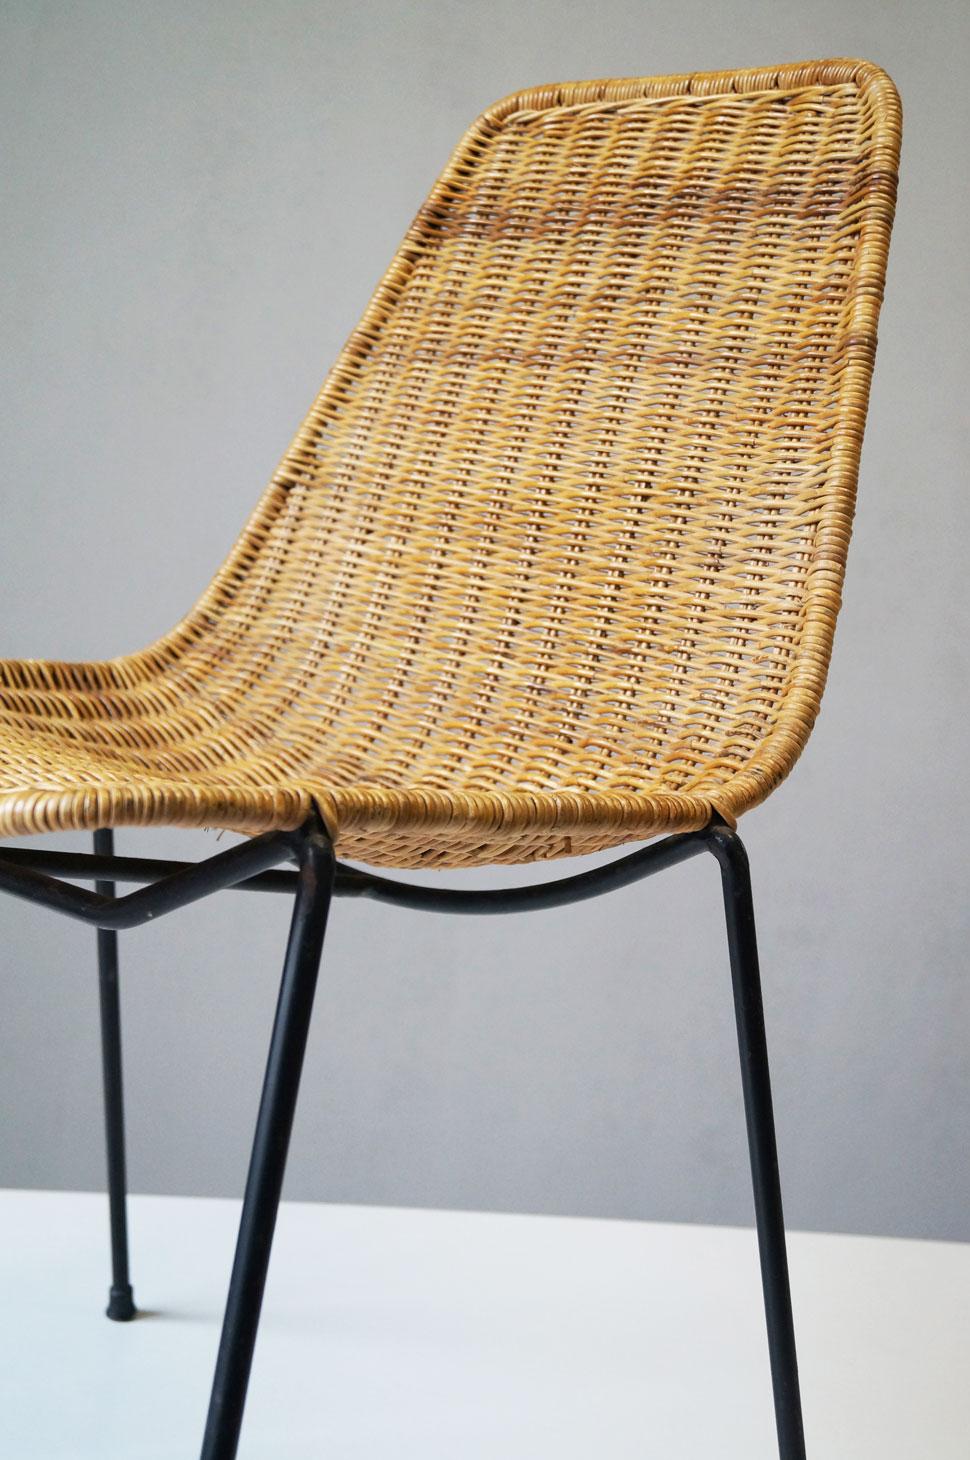 Sedia basket per home 20th century design for Sedia design 2016